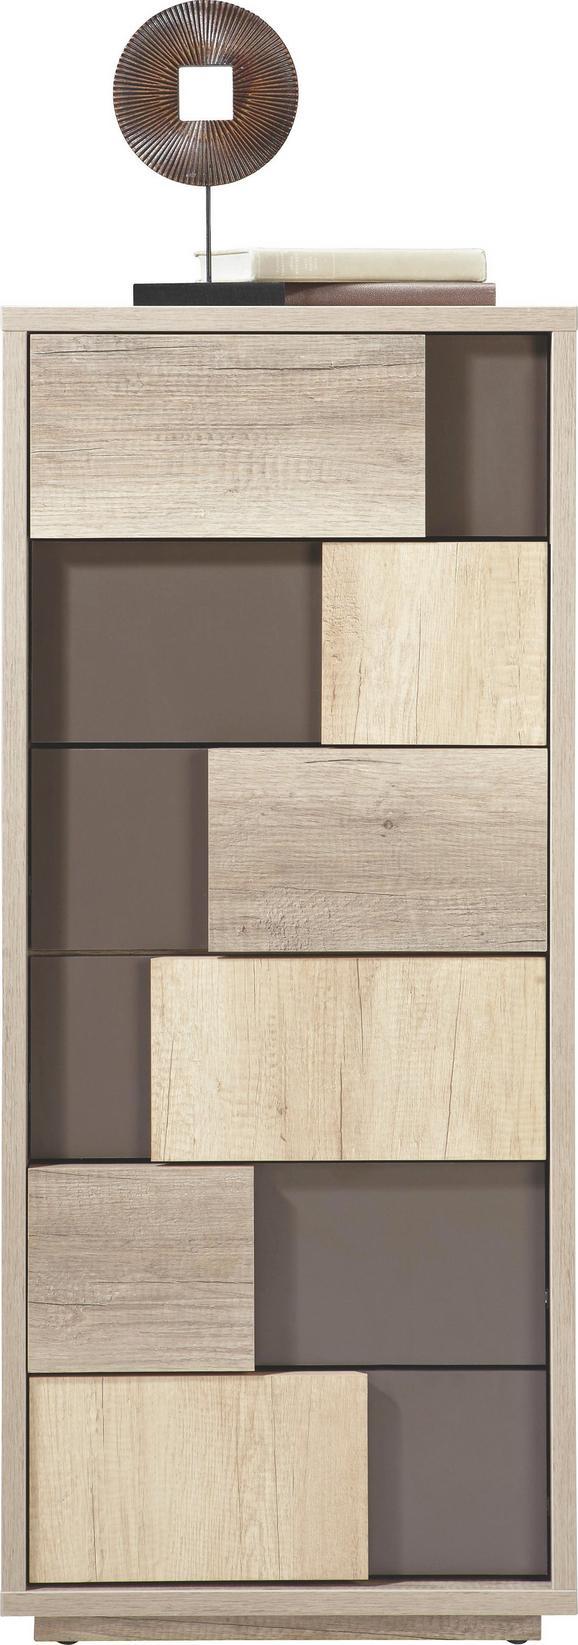 Kommode Braun/Canyon Grey - Blau/Grau, MODERN, Holzwerkstoff (51/119/45cm) - Mömax modern living